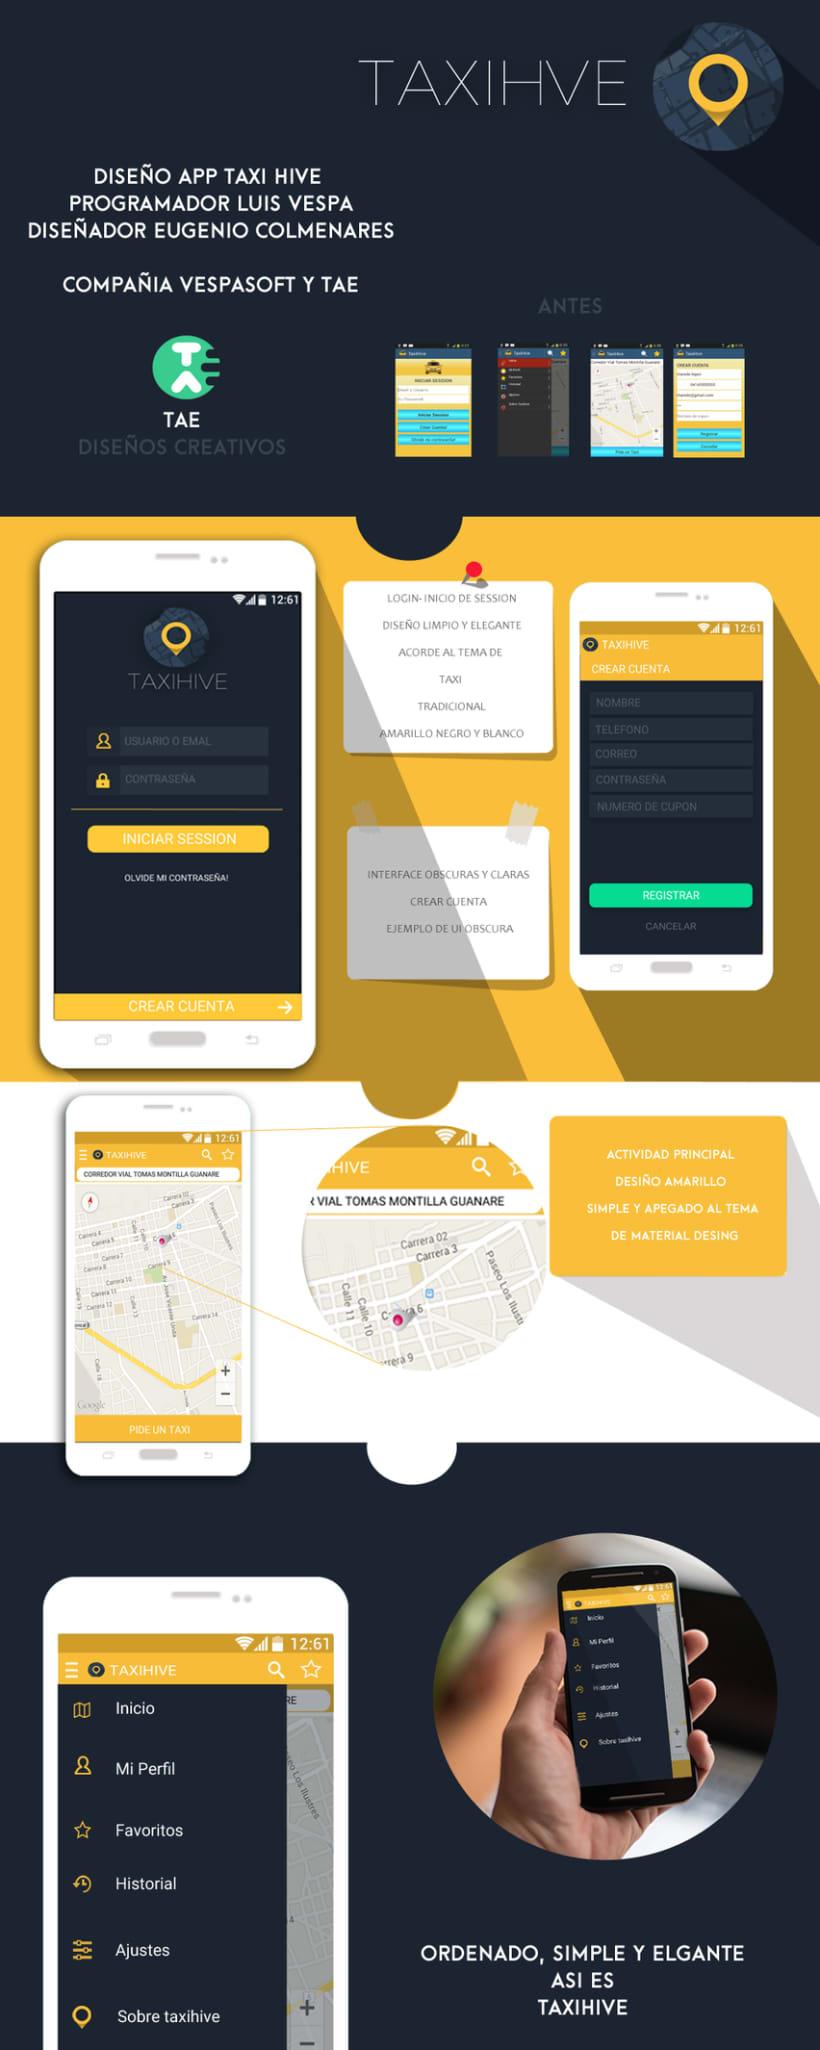 concept ui interface user for taxihive app venezolana, diseño conceptual de la interface de usuario de taxihive aplicacion venezolana  1